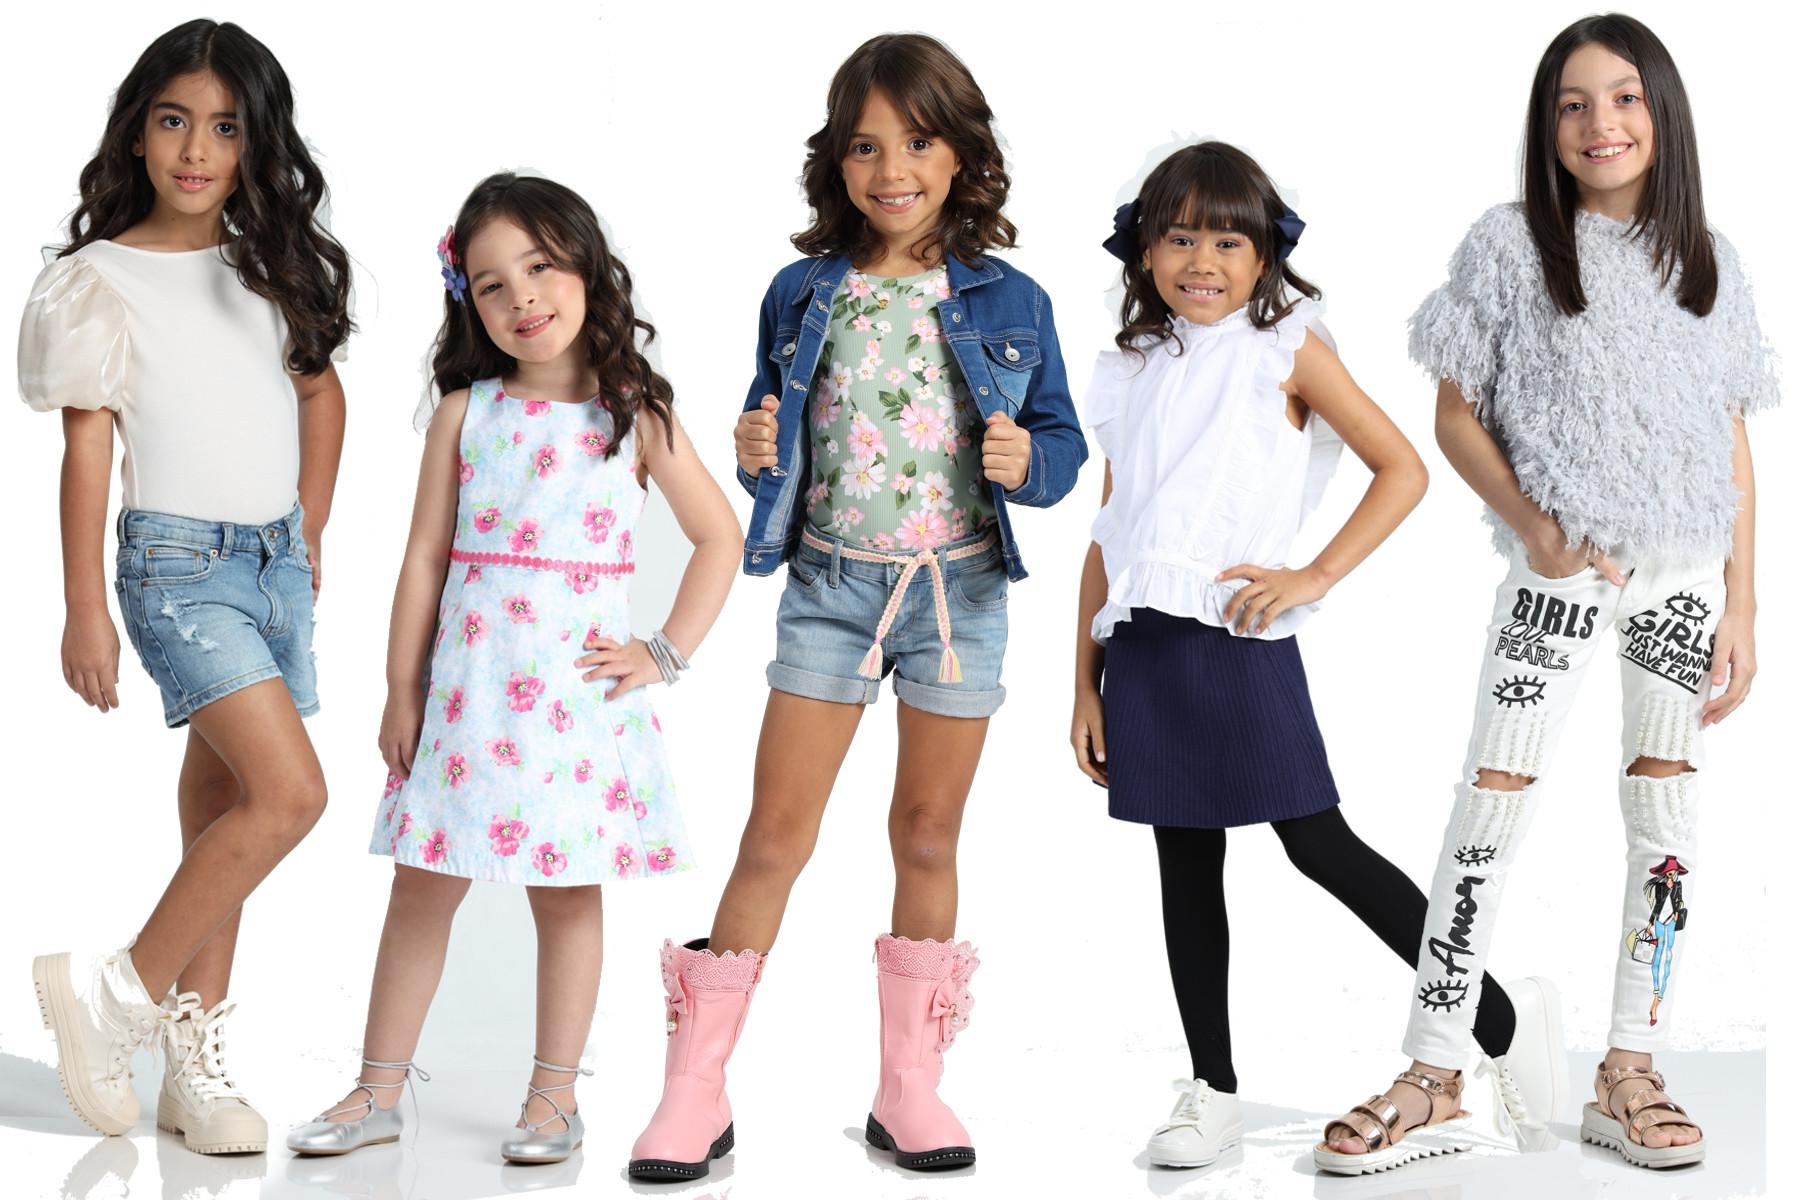 Style Studio Girls - 9:00am-10:00am